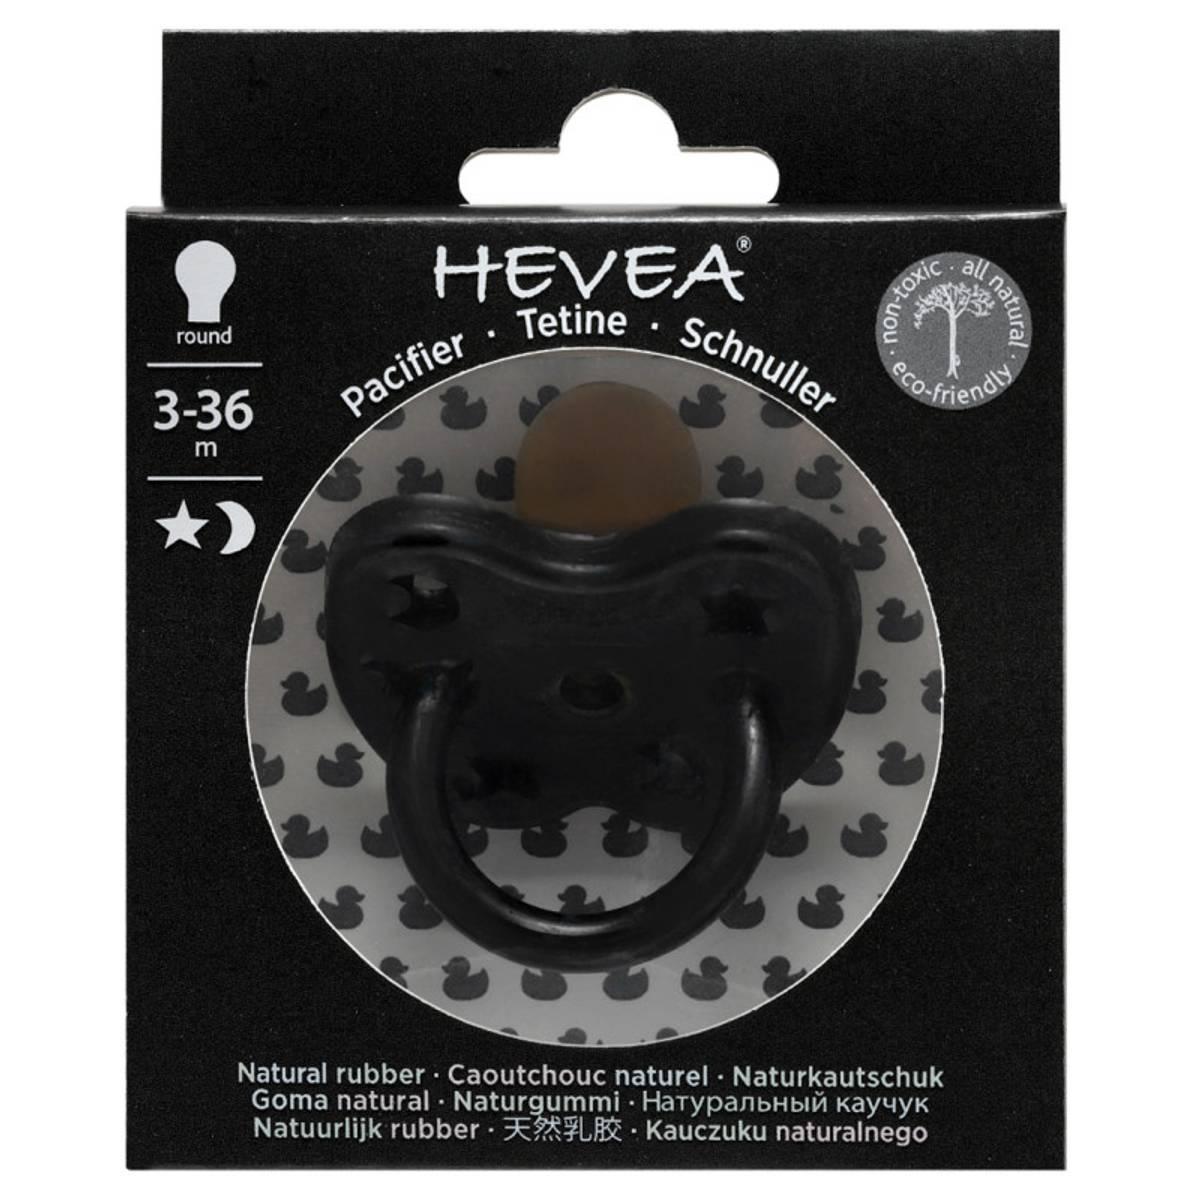 Ortodontisk smokk 3-36 mnd, Outer Space Black / Hevea